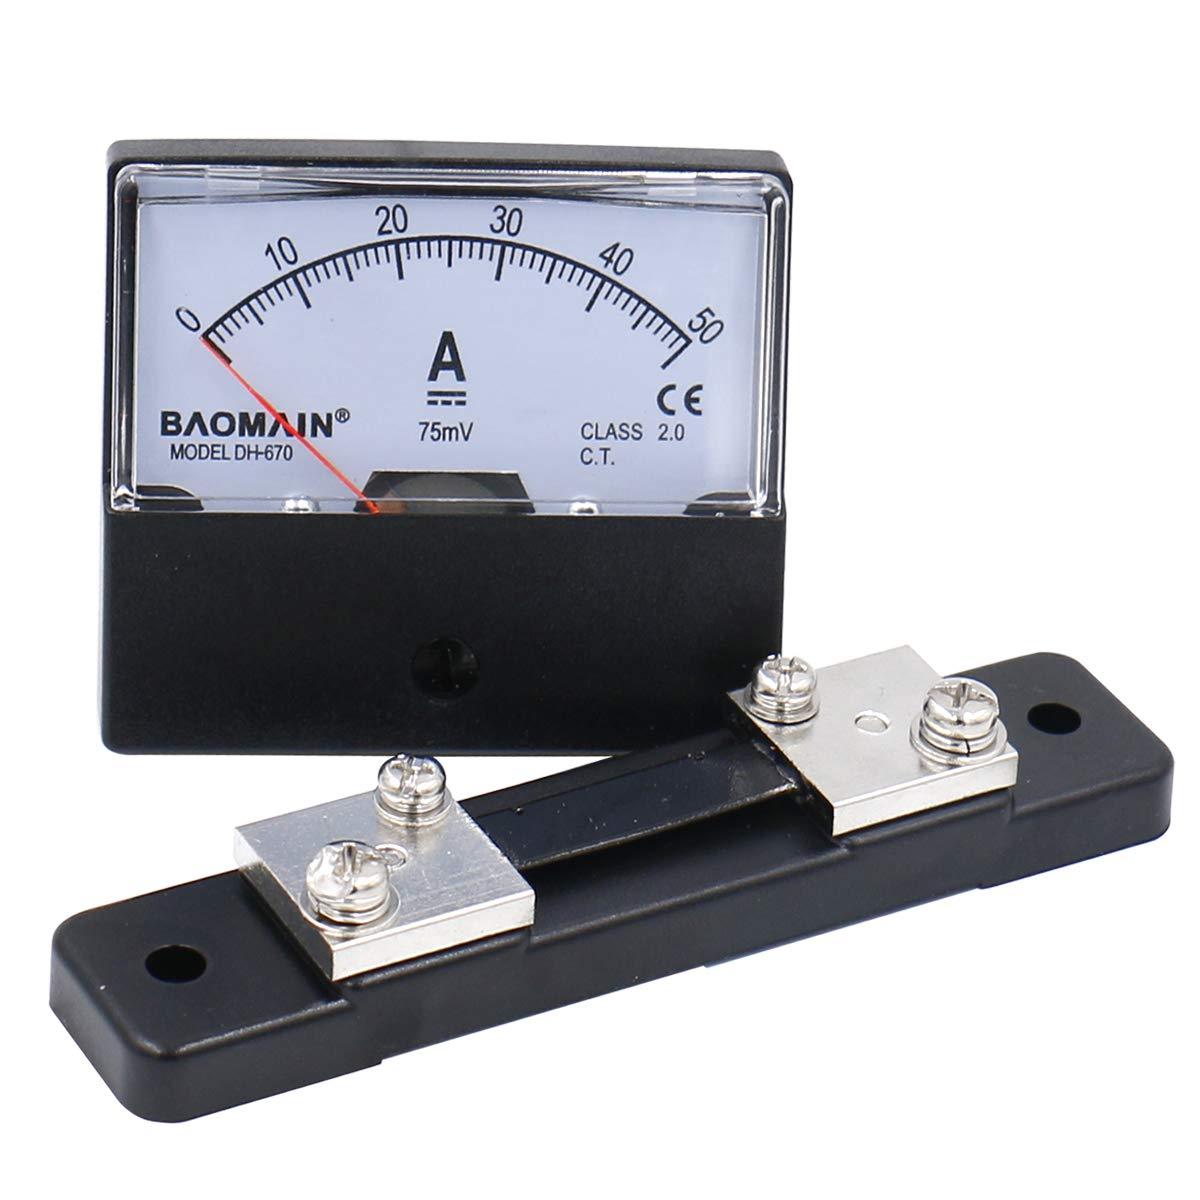 Analog Digital Panel Meters 30Amp 75mV DC Current Shunt